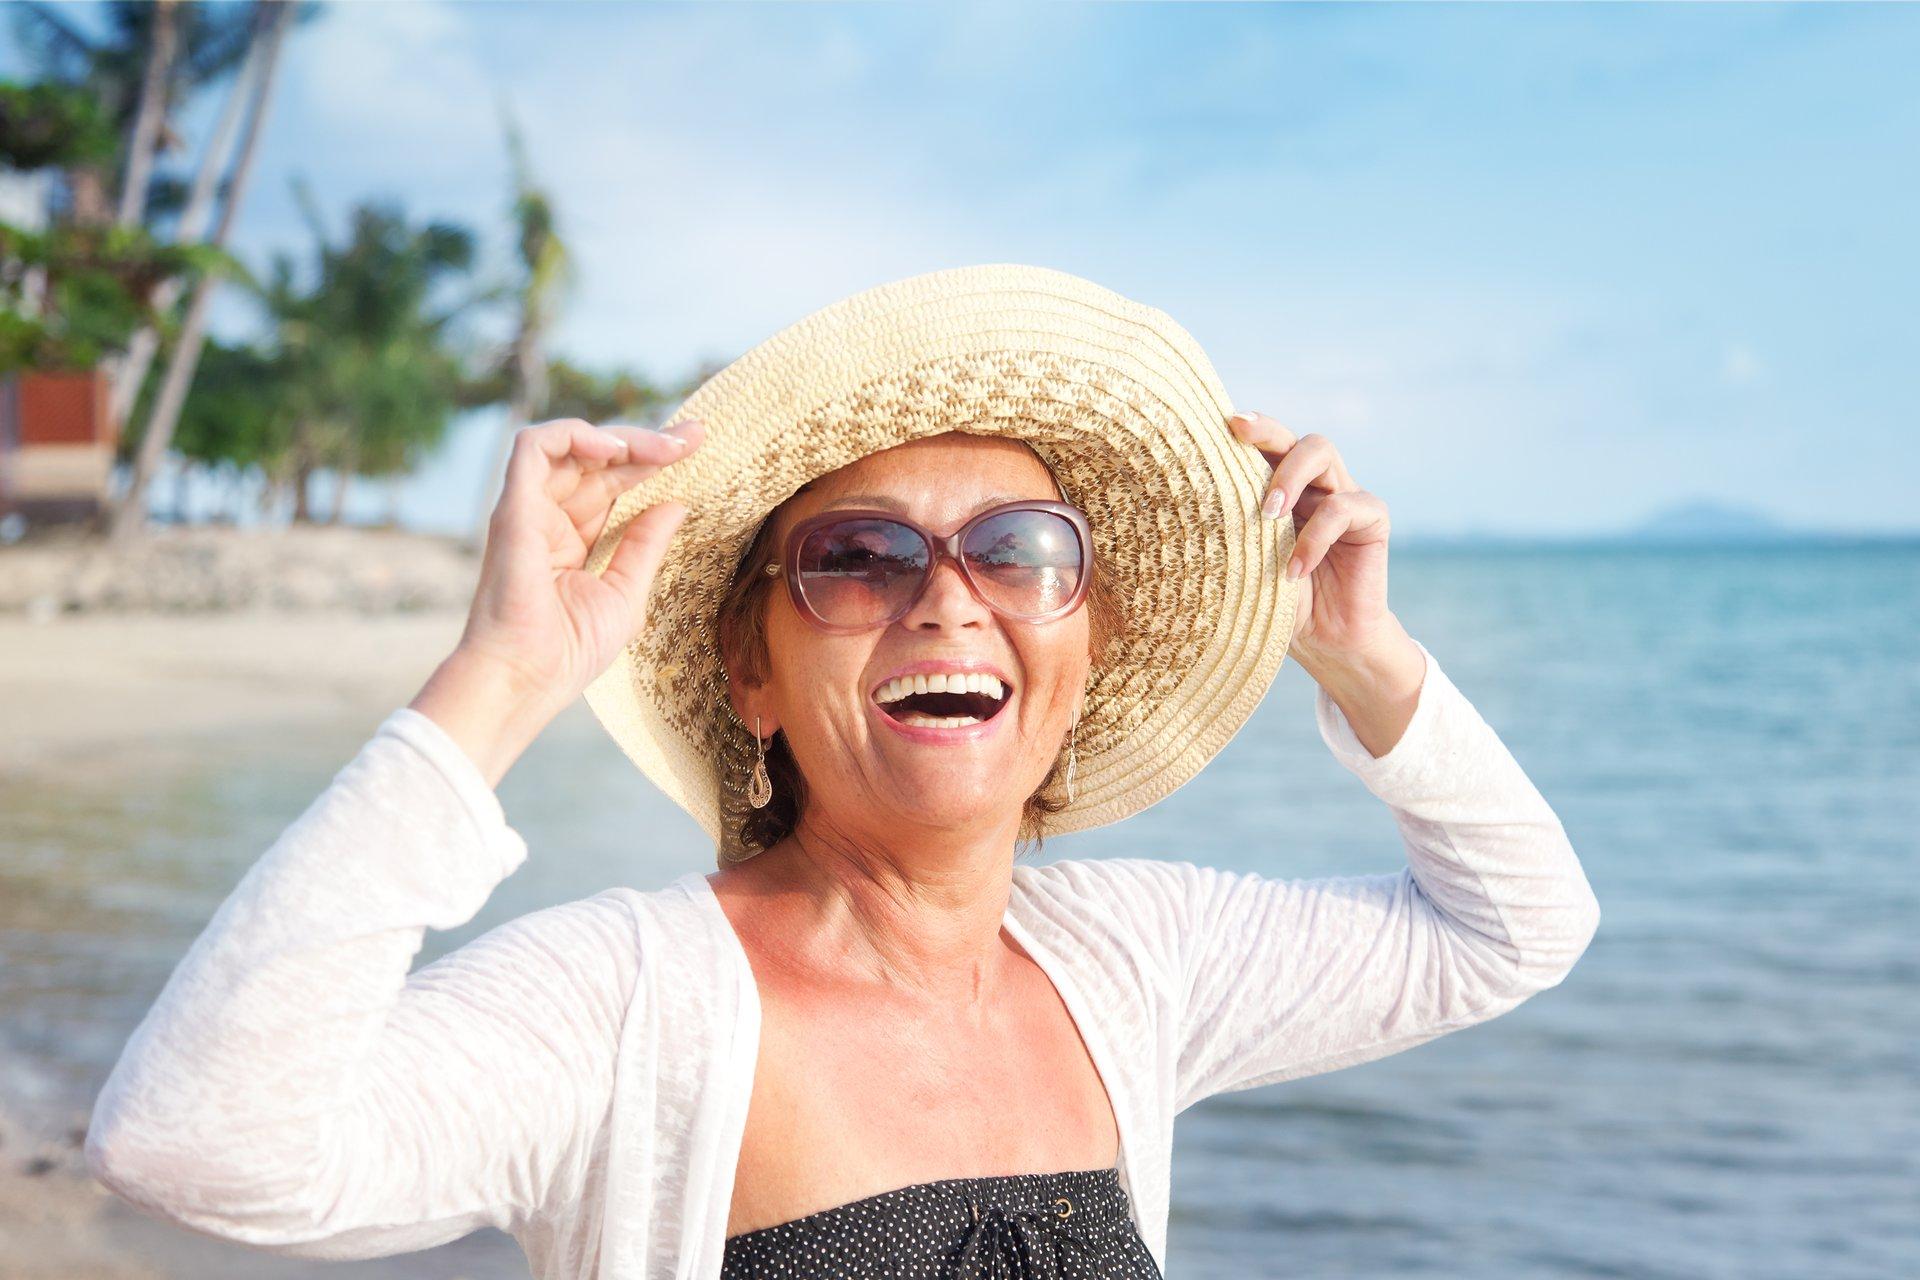 Woman in sunhat on beach.